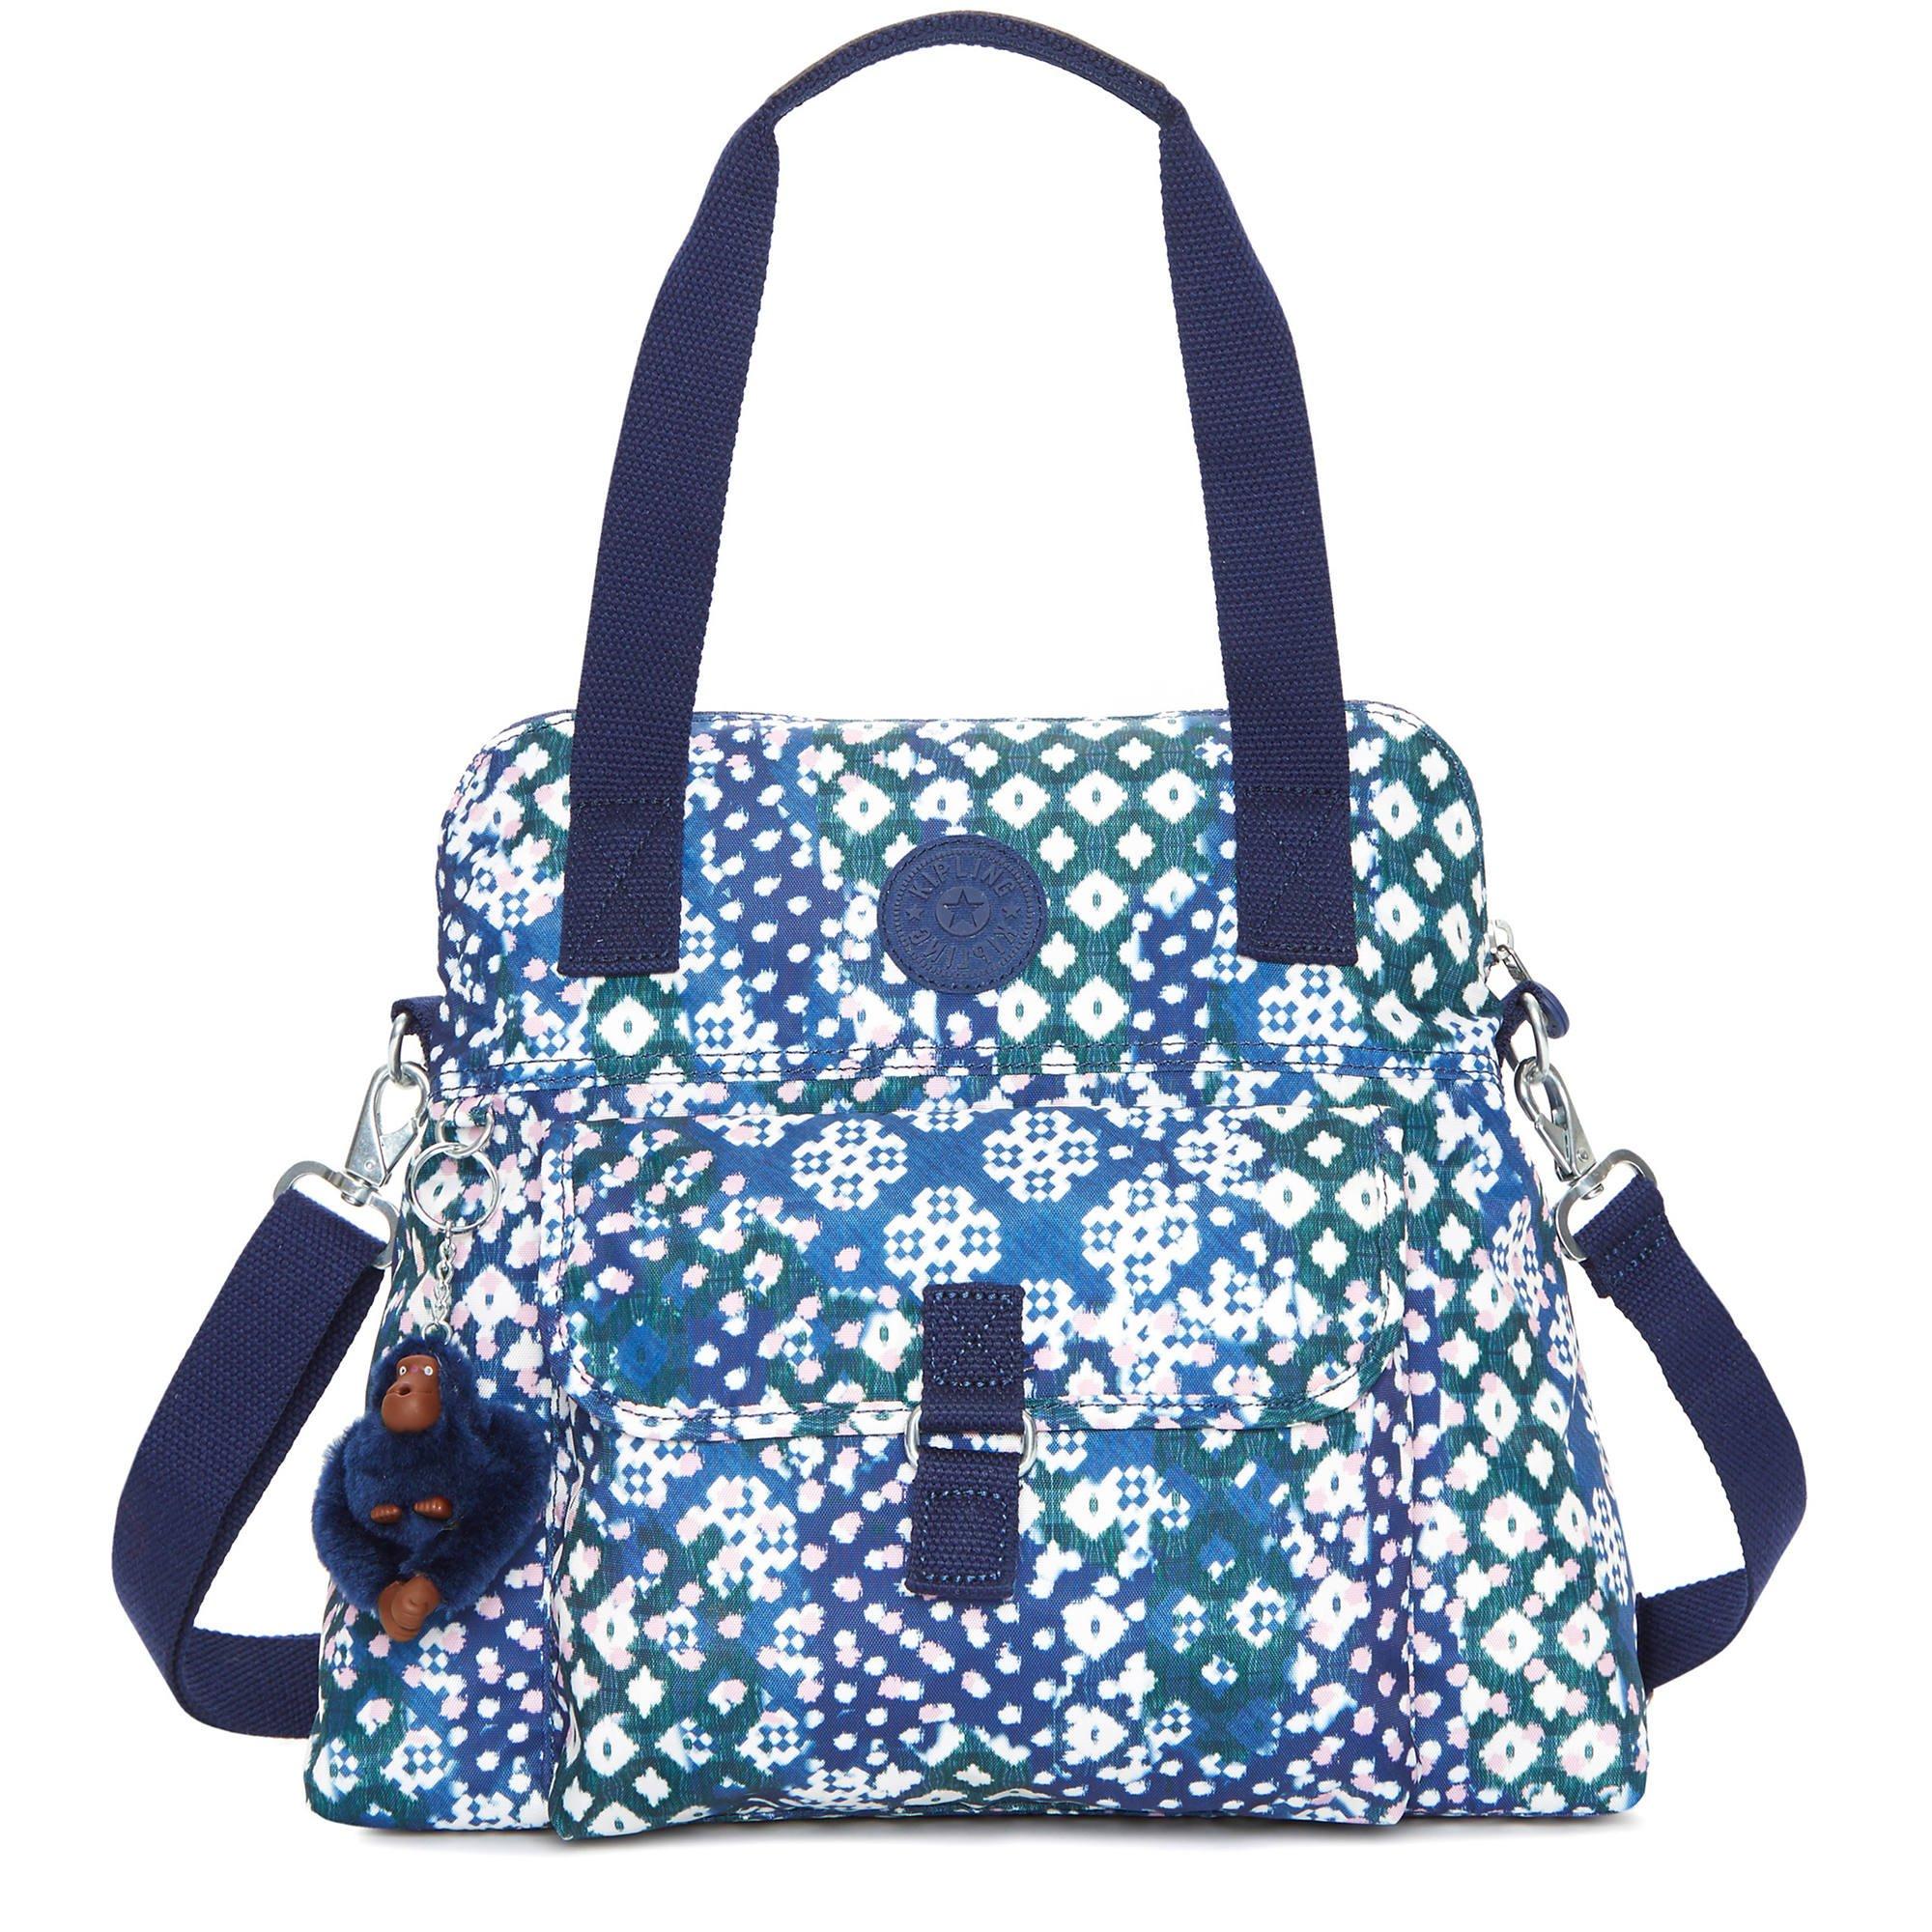 Kipling Women's Pahneiro Printed Handbag One Size Carnival Mix by Kipling